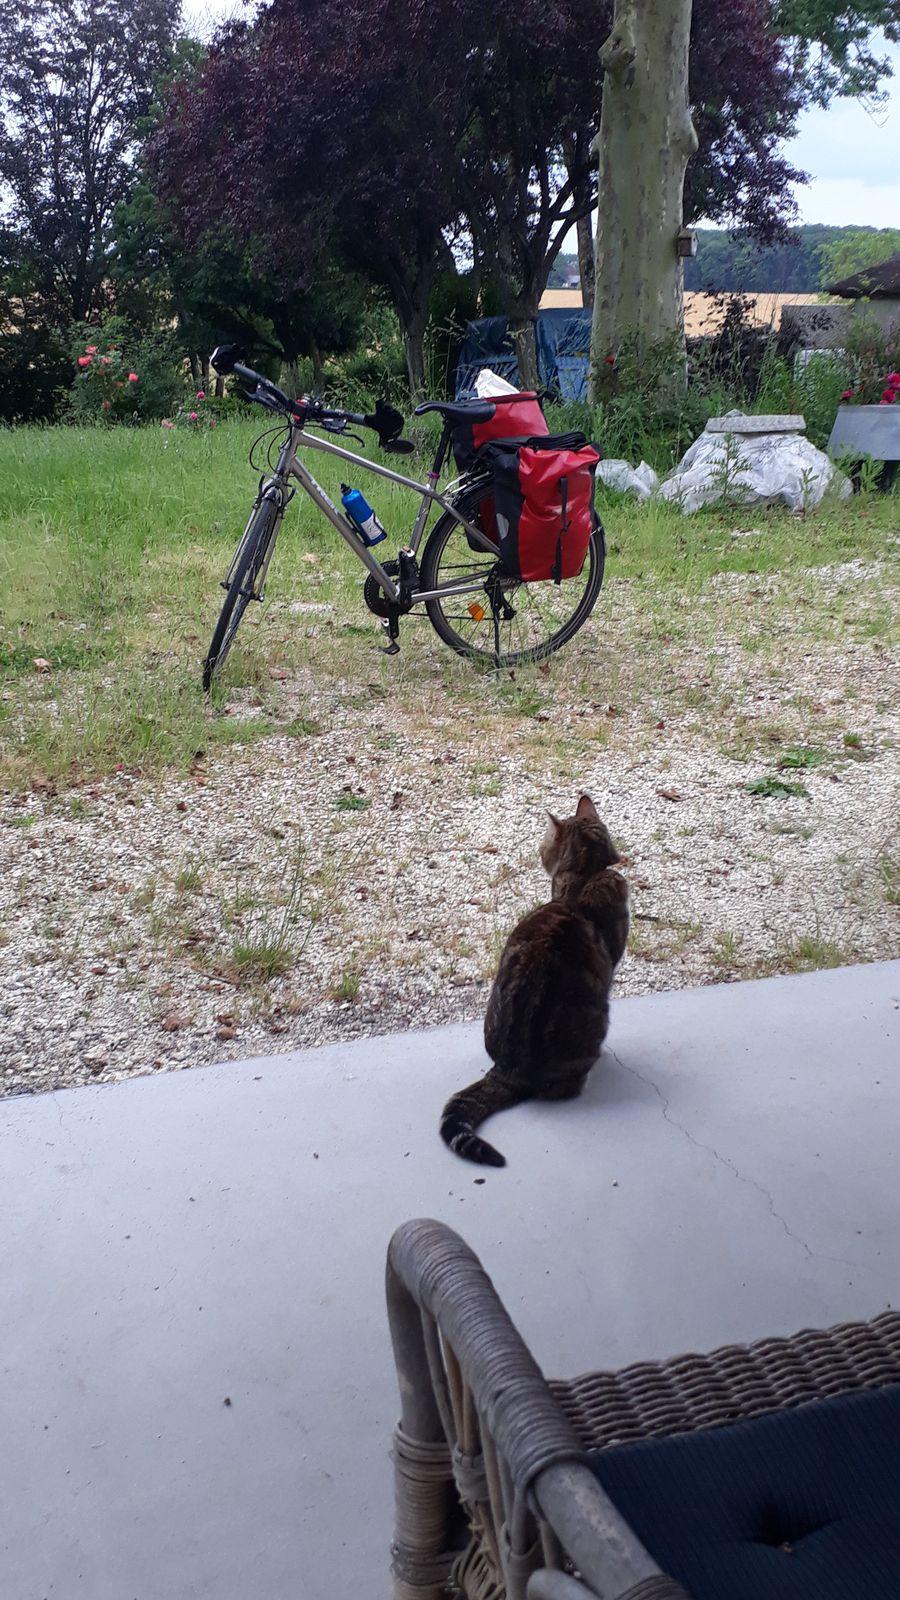 Le chat et moi on attend